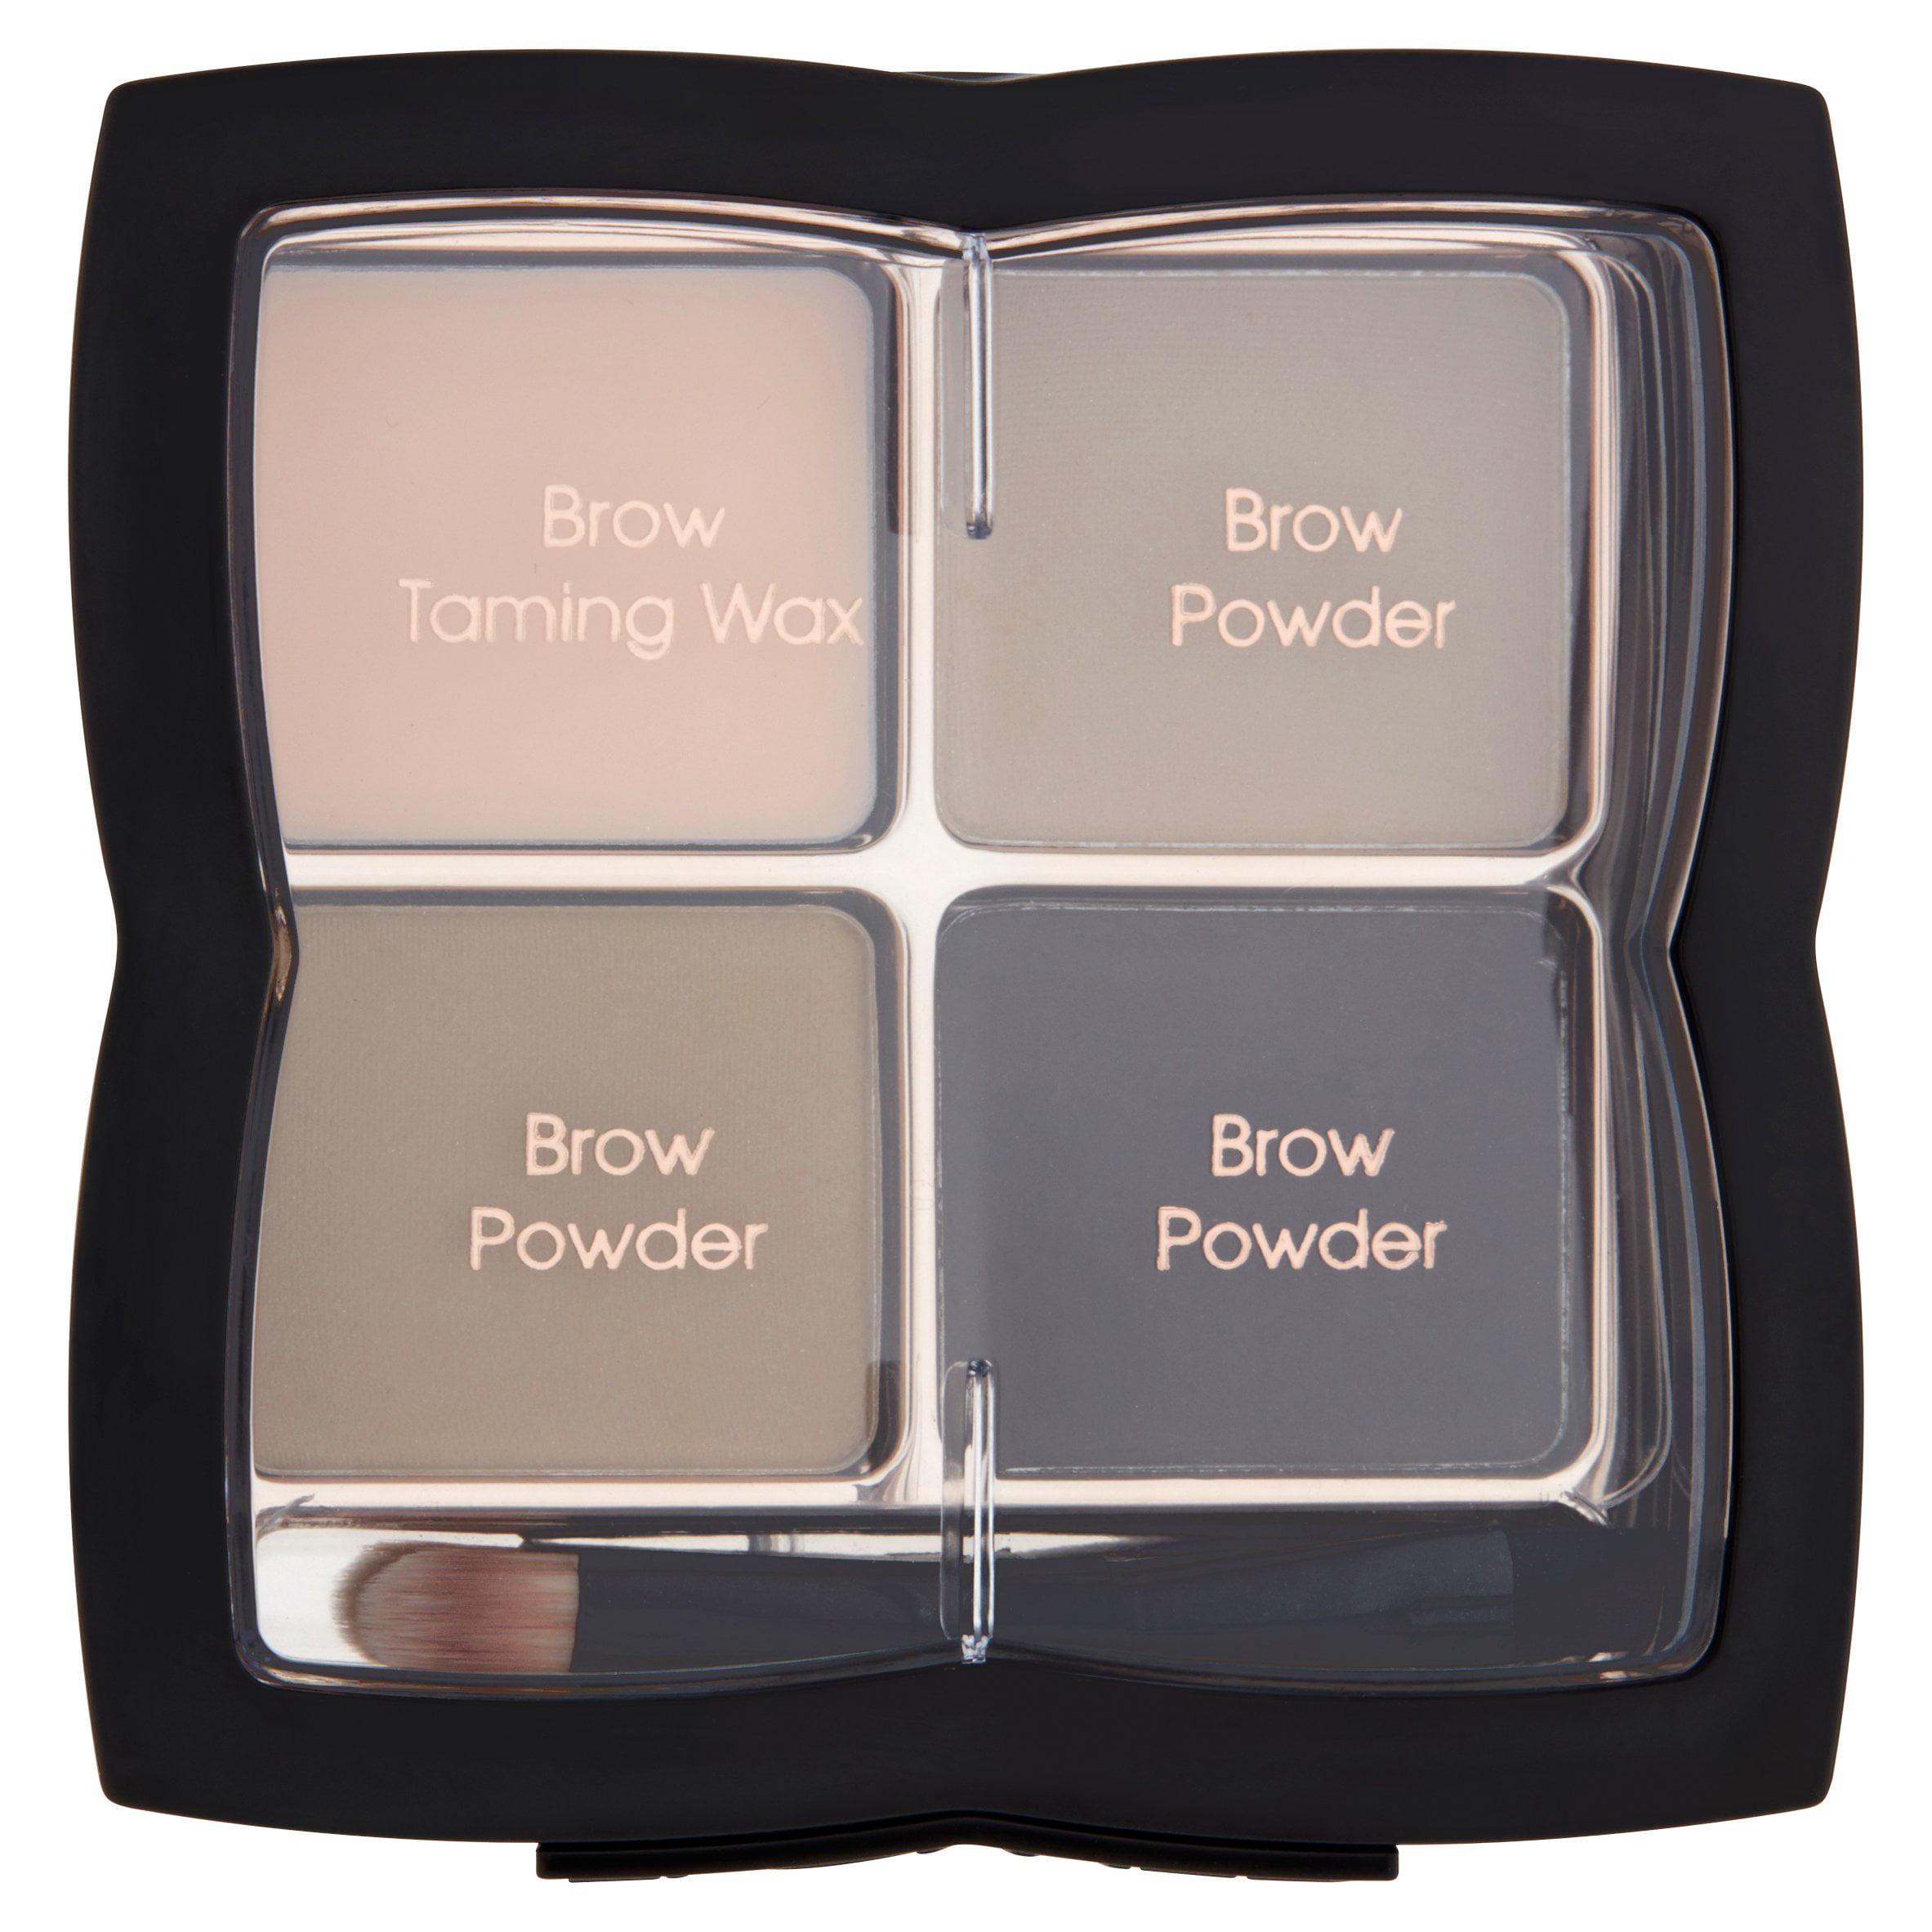 Flower Complete Brow Kit, Take a Brow, 0.03 oz